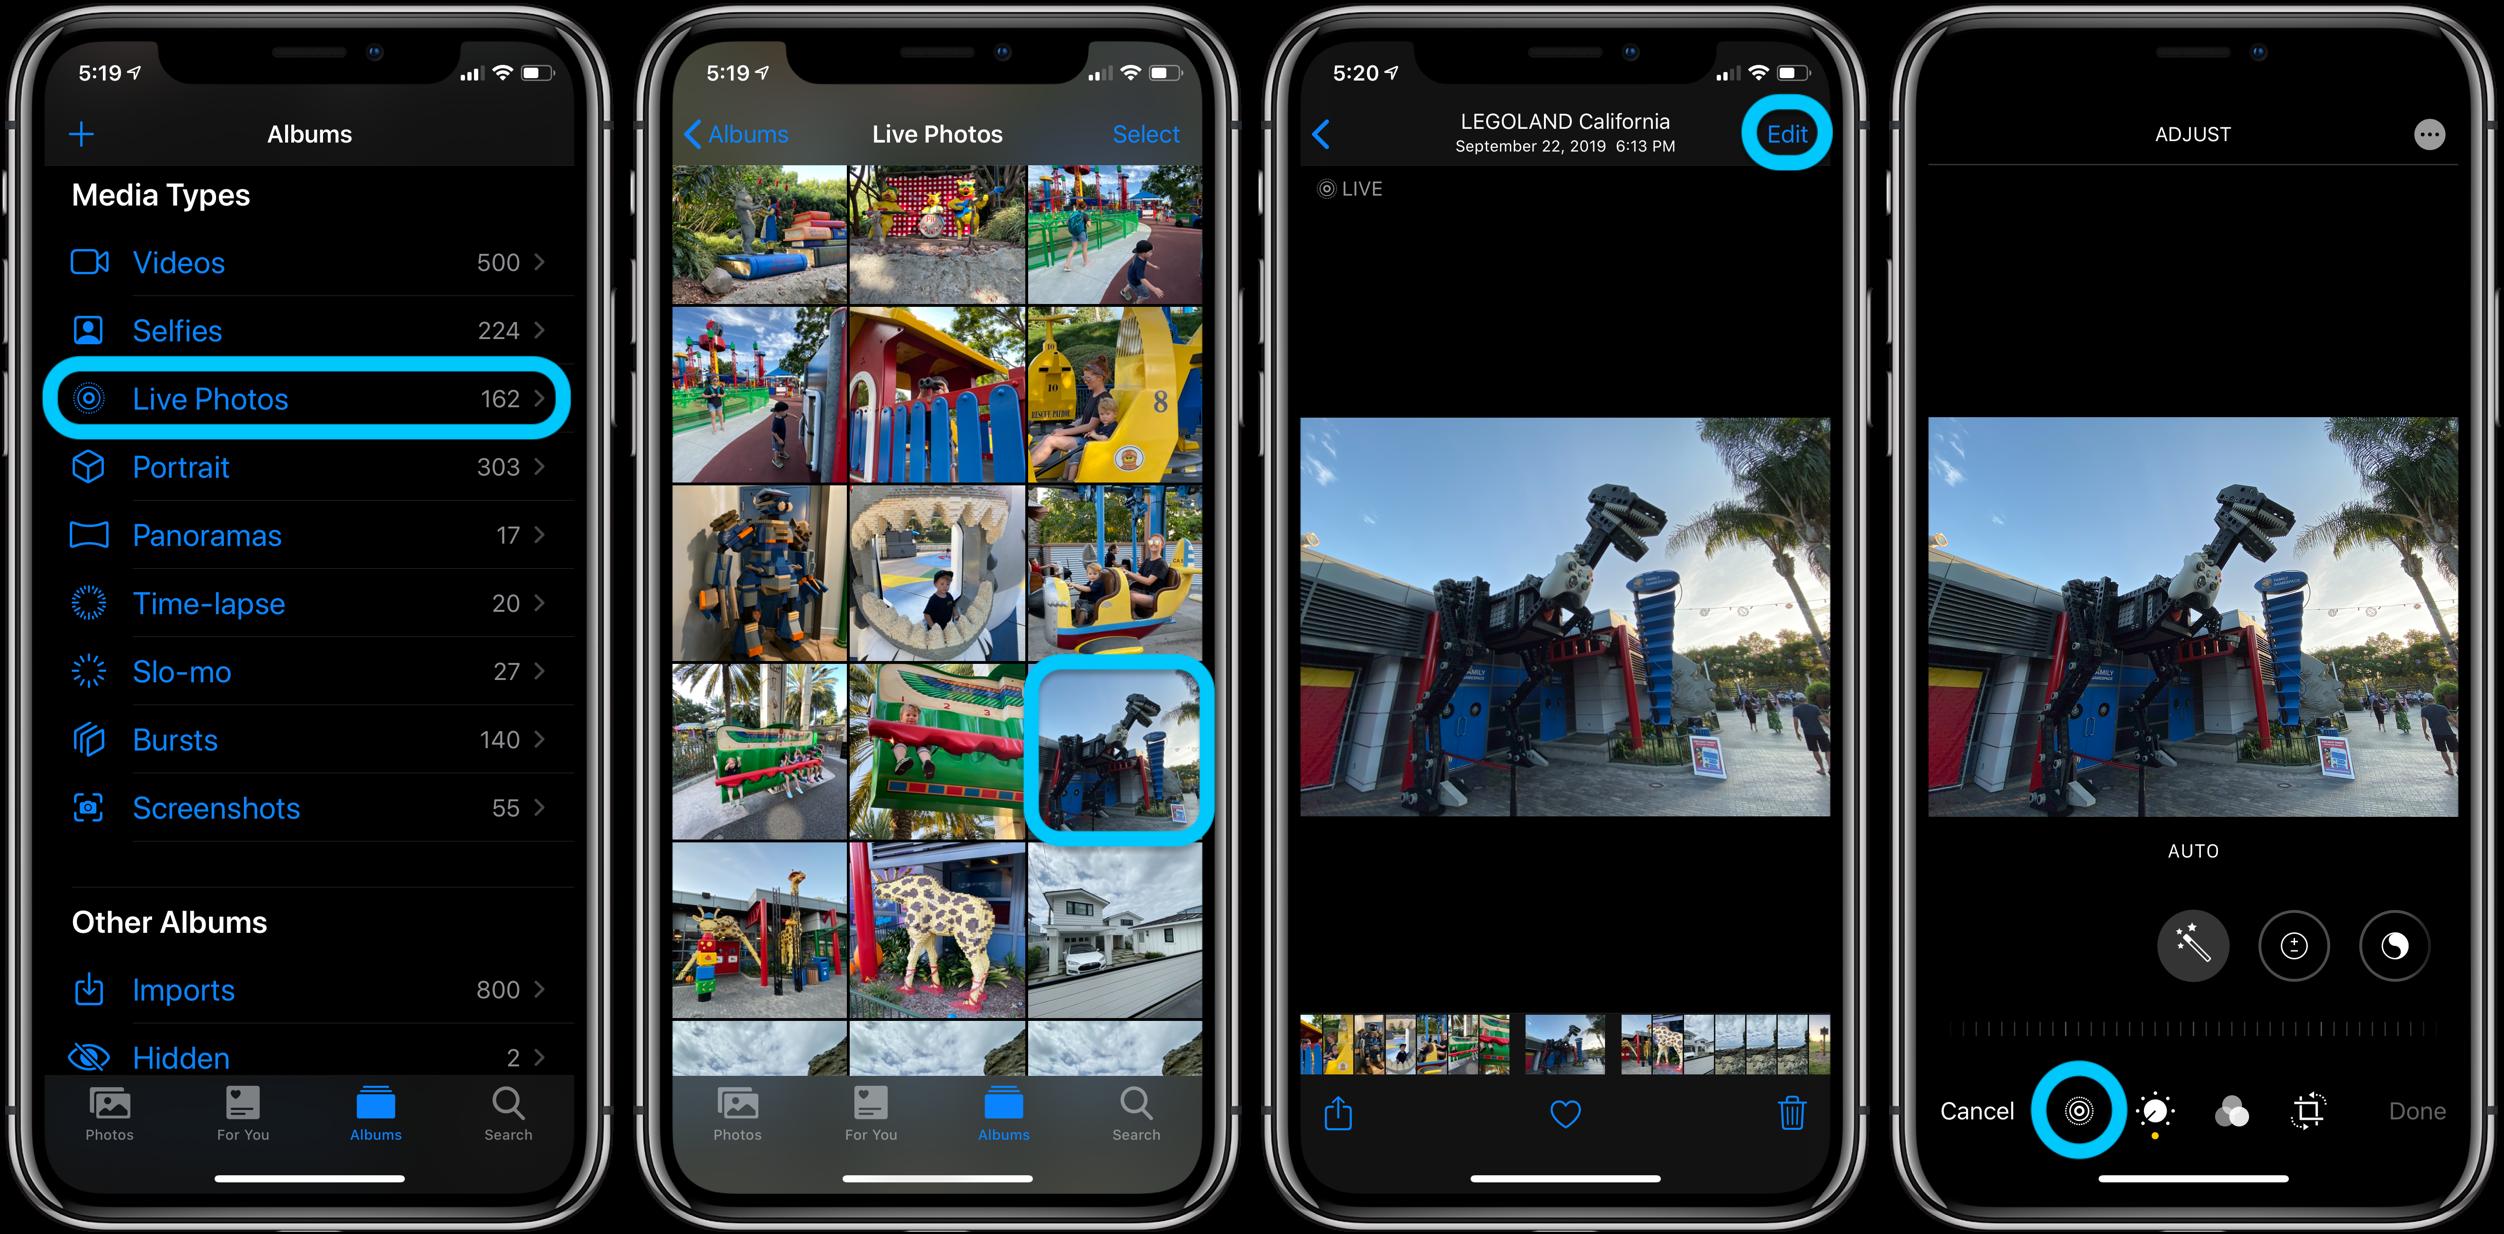 "<span href=""https://9to5mac.com/2020/01/16/iphone-how-to-turn-off-live-photos-existing-pictures/"">iPhone: Cómo desactivar Vivo Fotos de las fotografías existentes</a>"